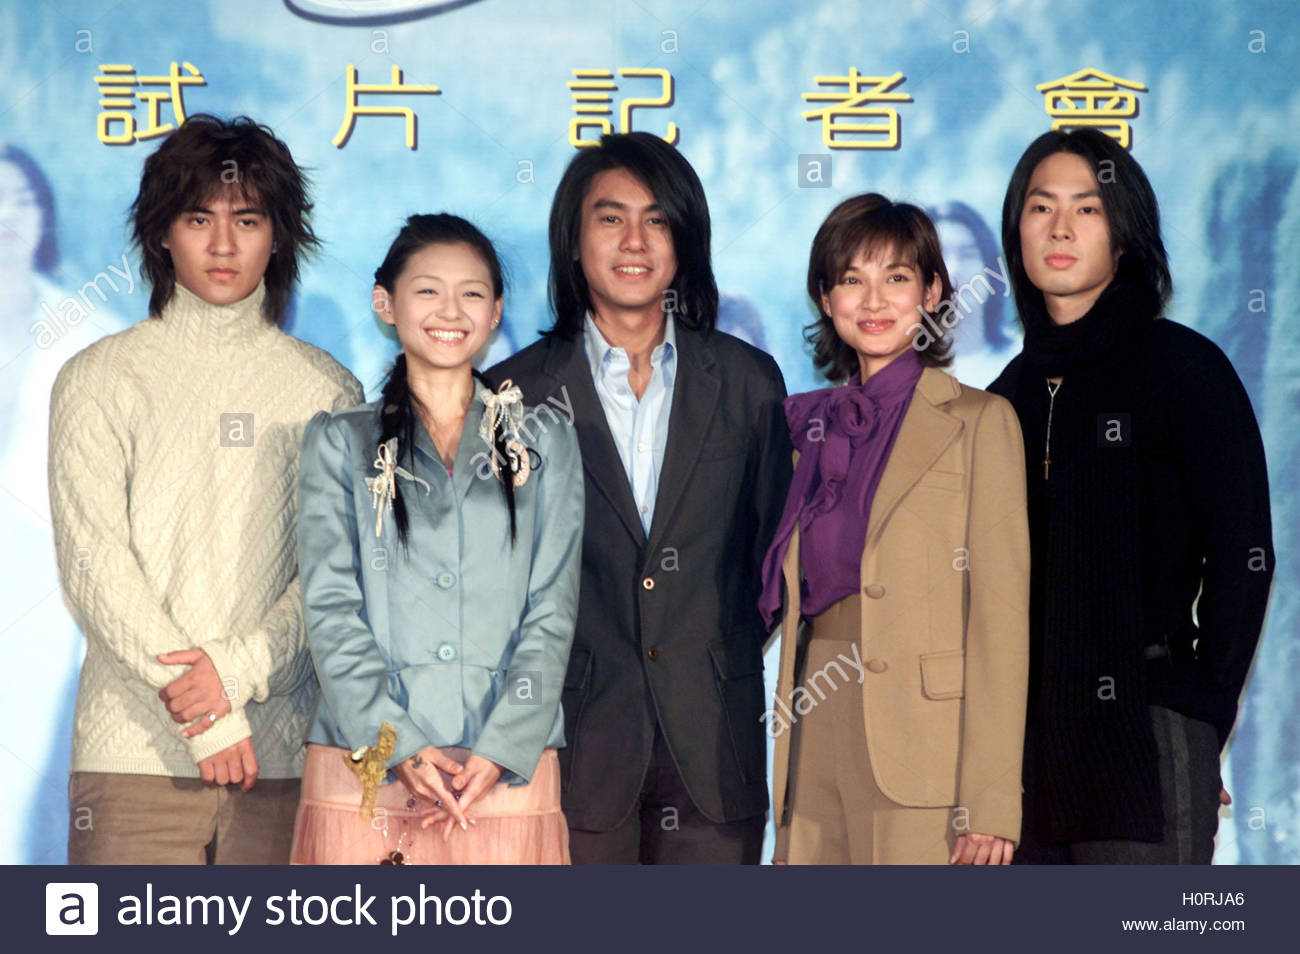 Ken Chu - Wikipedia